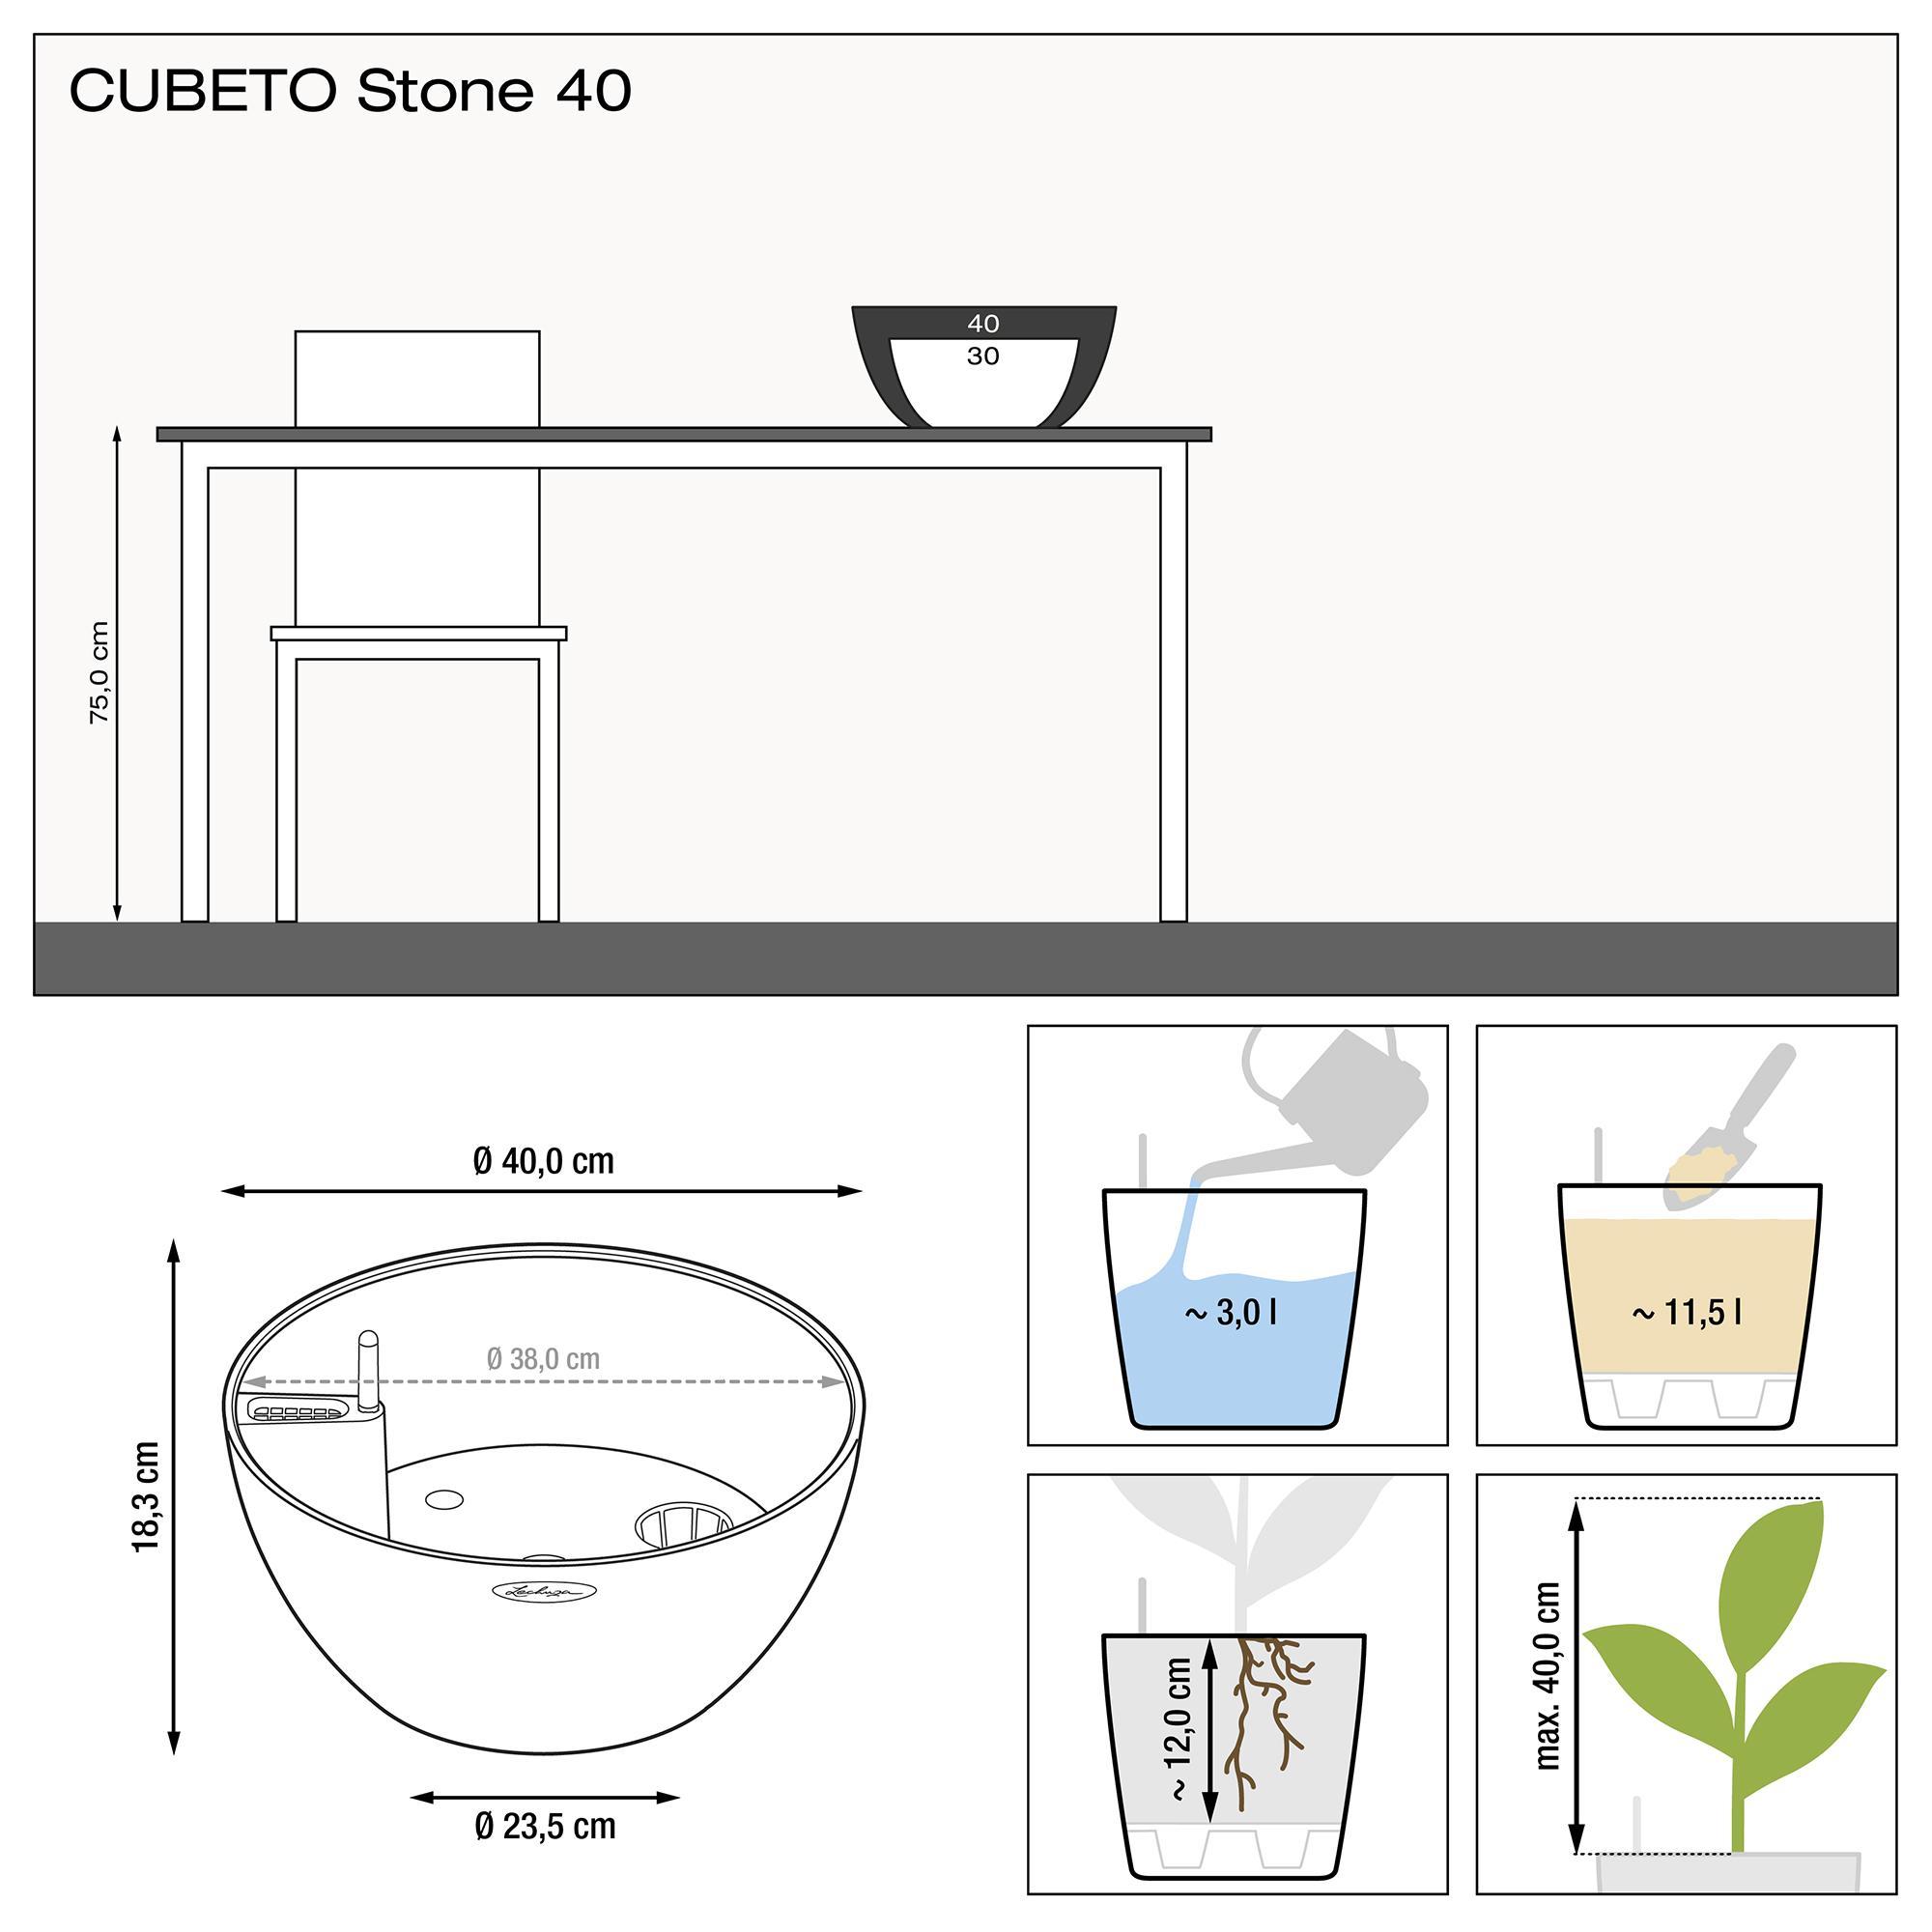 le_cubeto-stone40_product_addi_nz